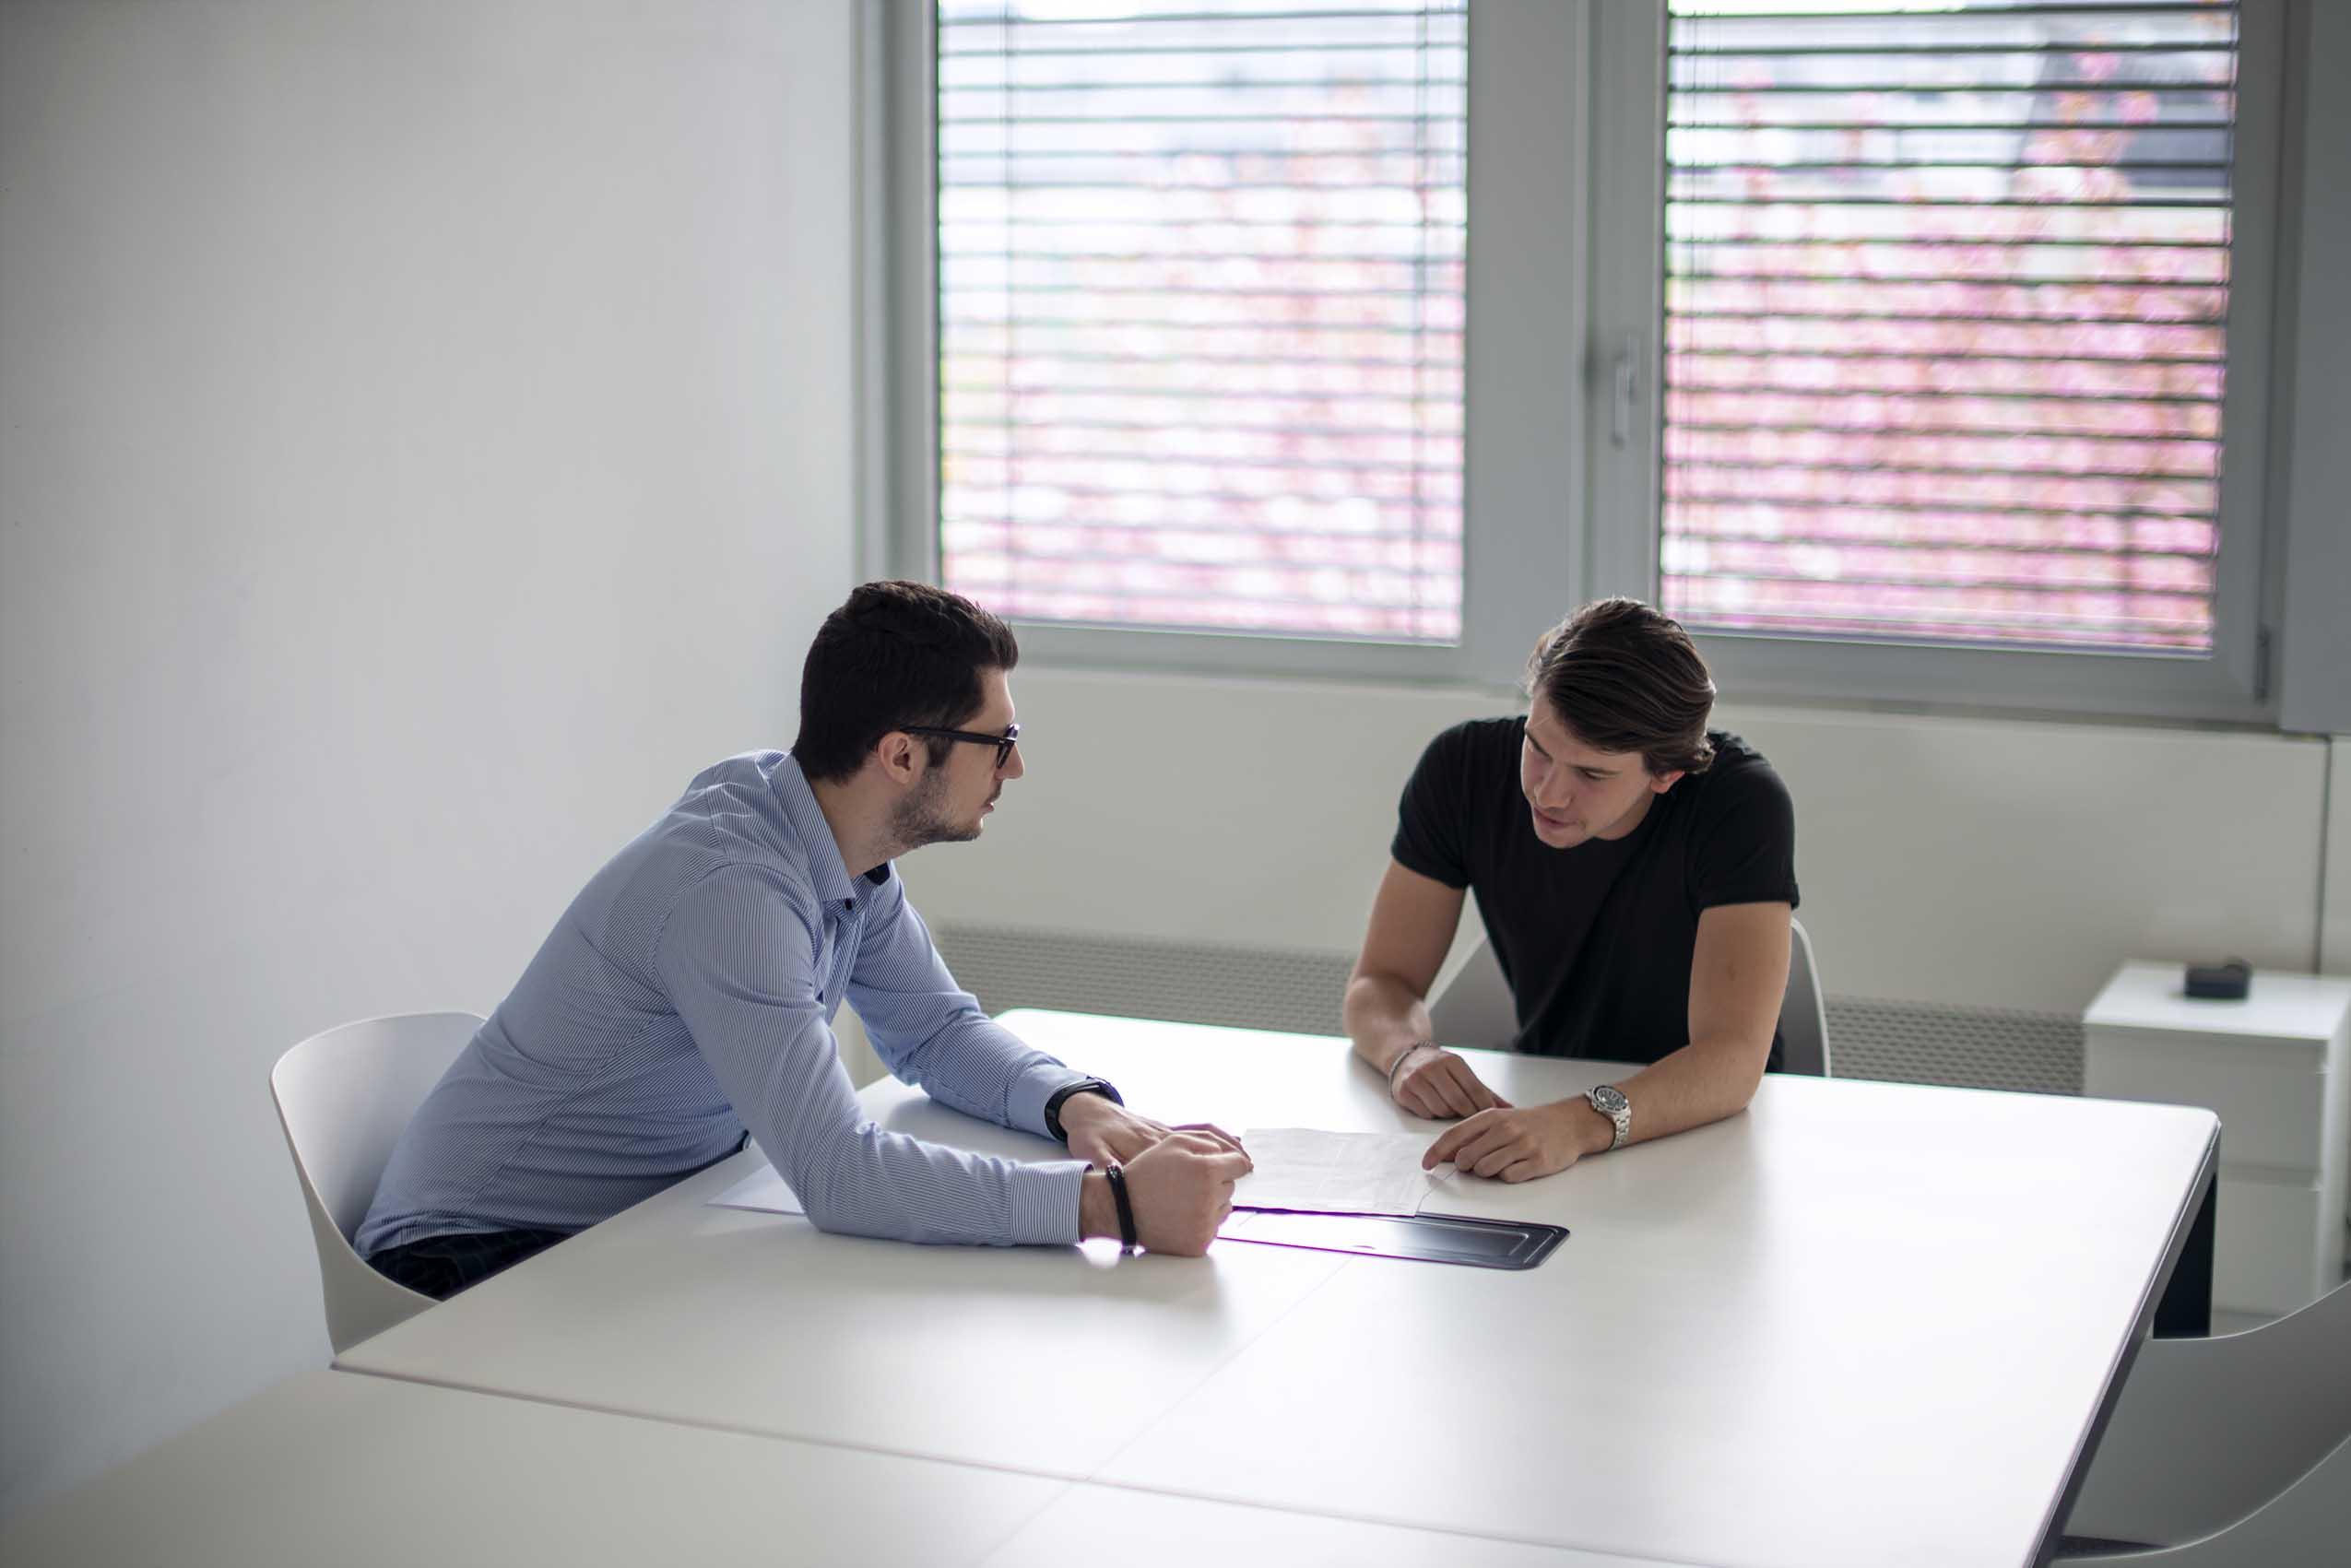 Meetingroom, Smartwork, Negotiation, rolex